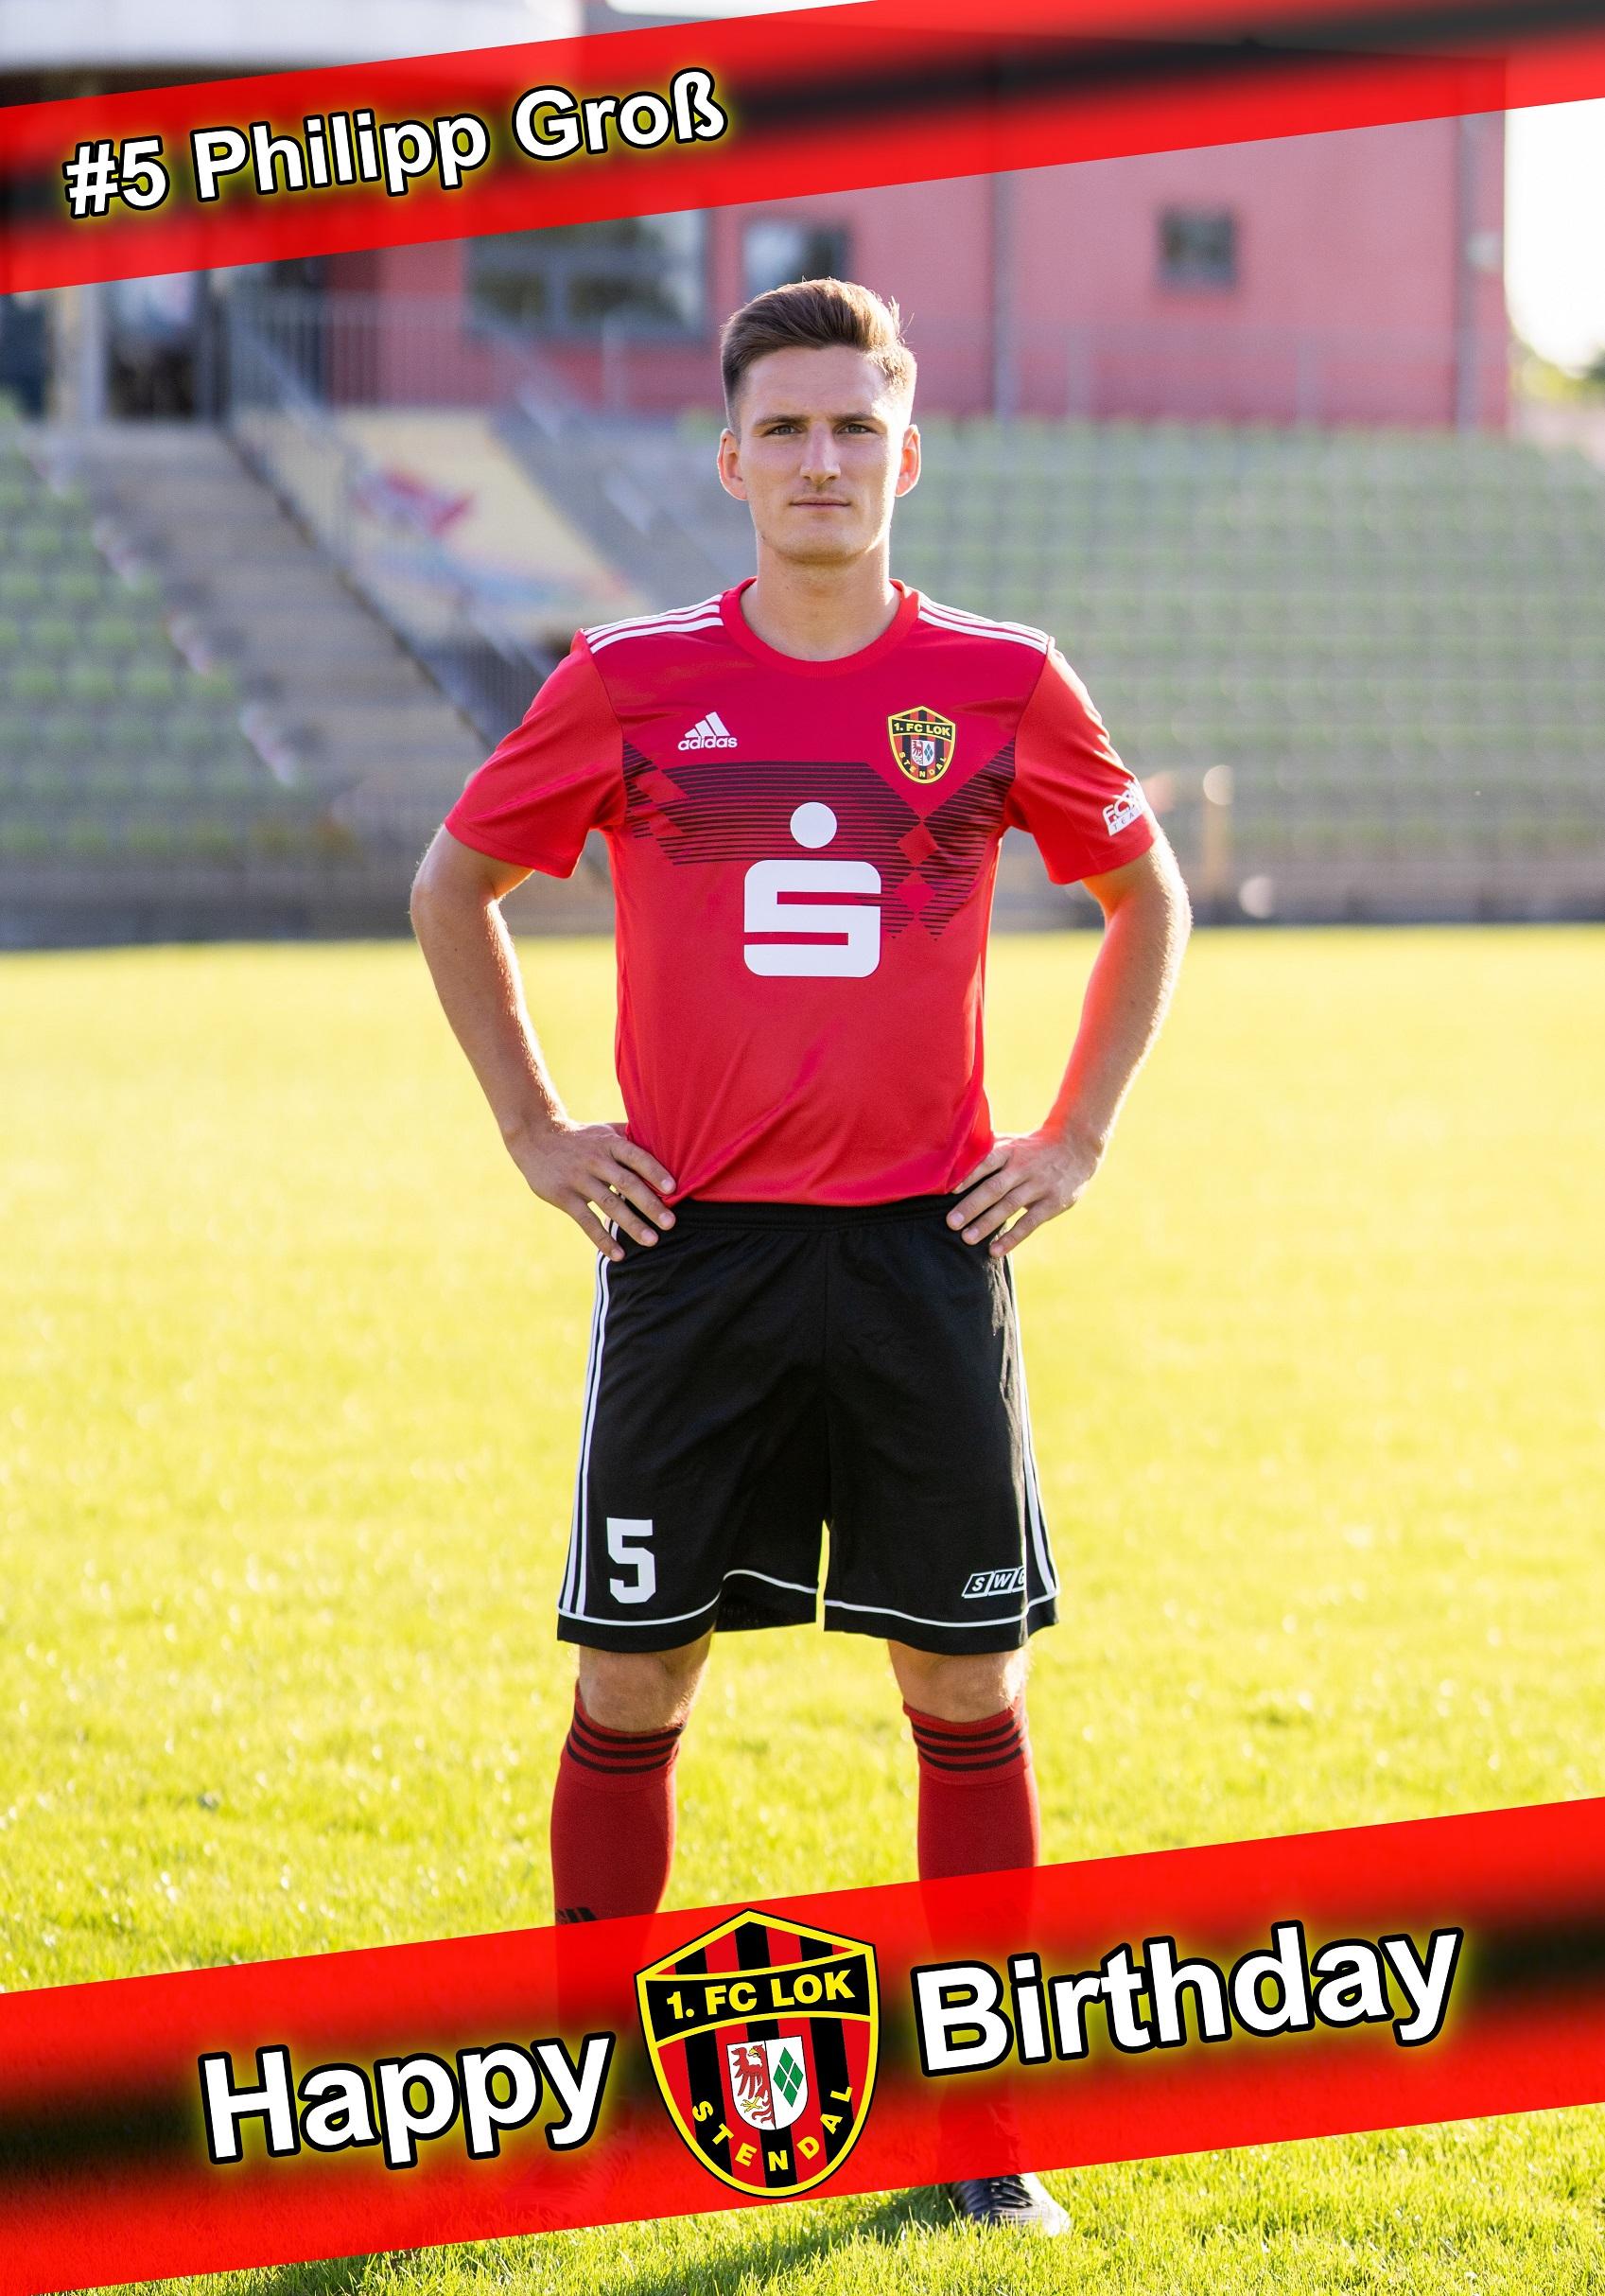 Happy Birthday Capitano - 1. FC Lok Stendal